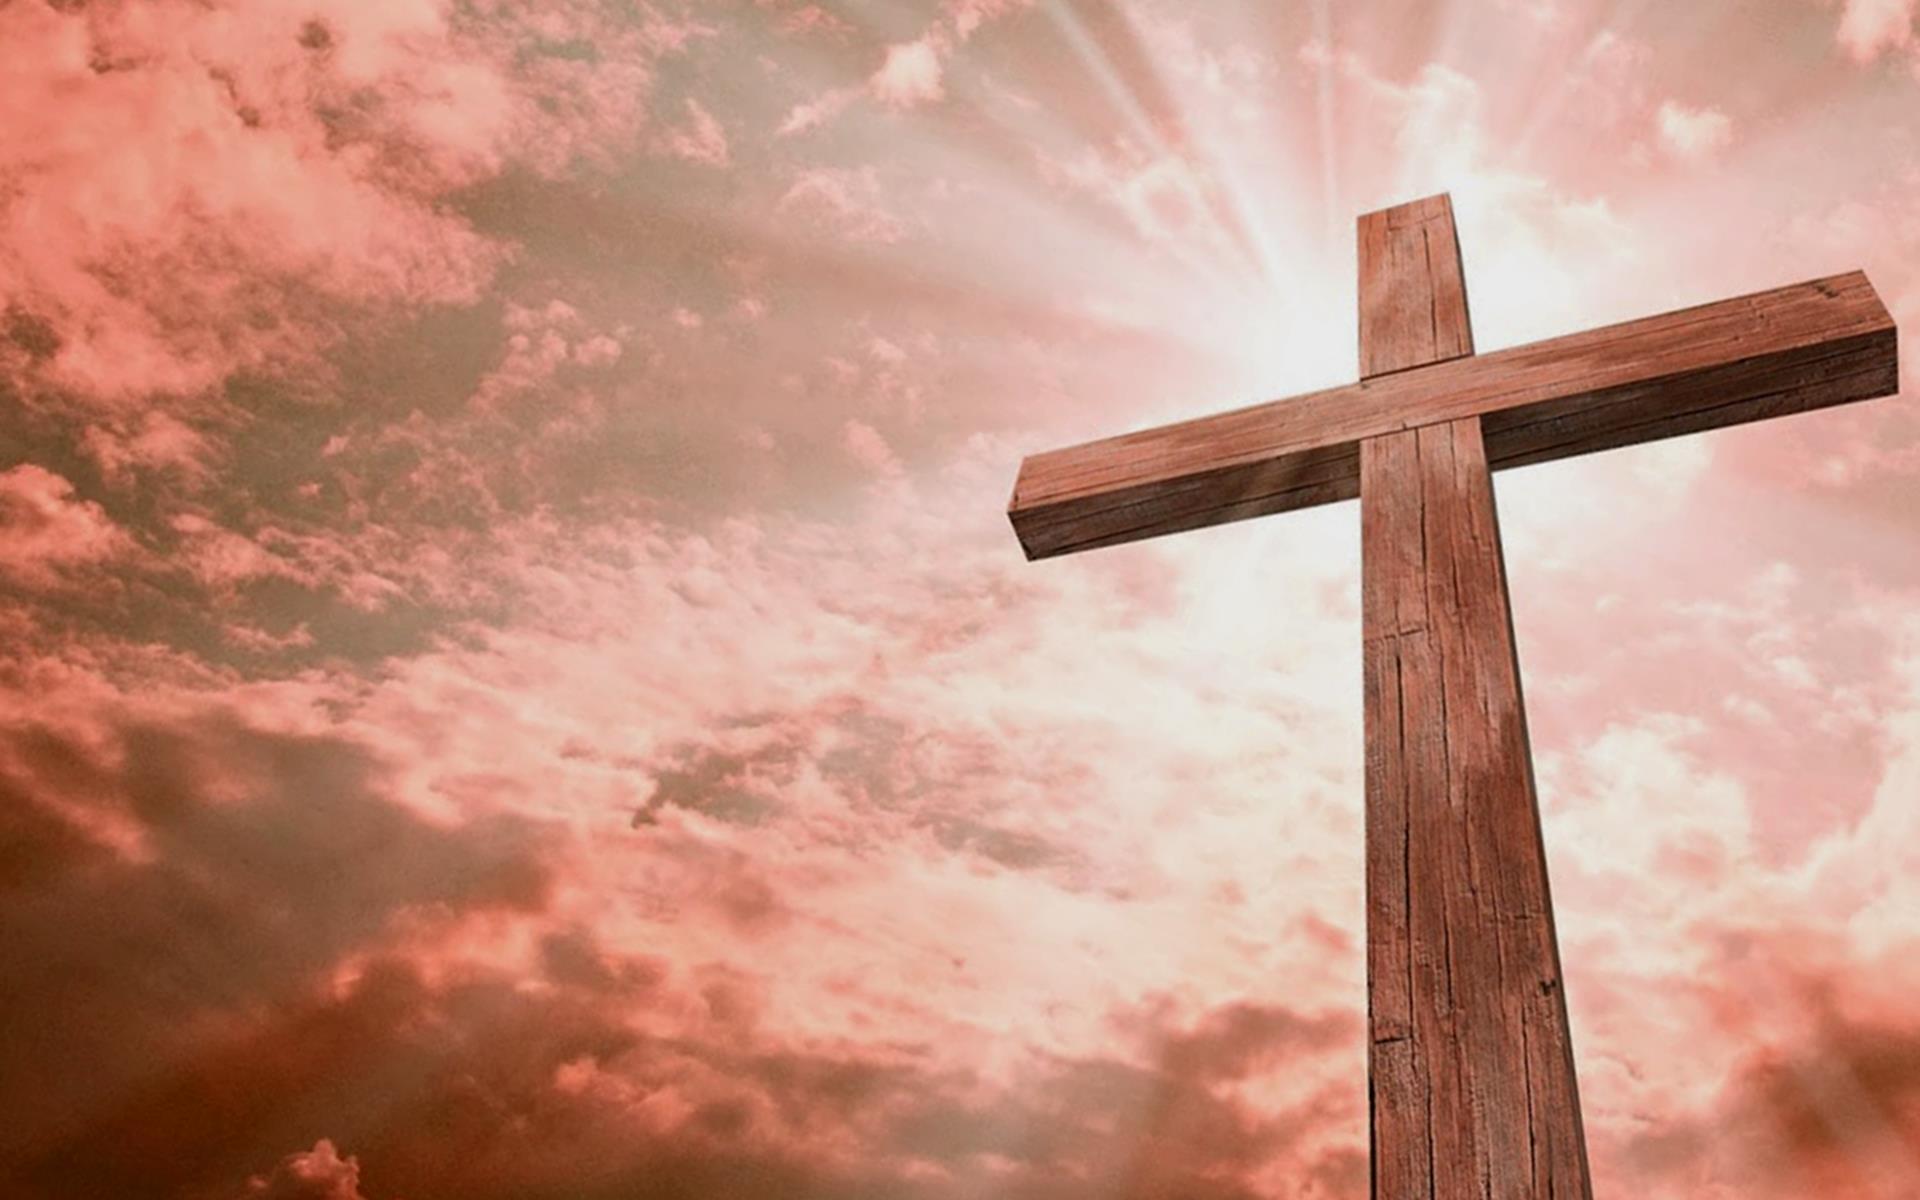 Christian Cross Nice Symbol Wallpaper wallpaperspickcom 1920x1200